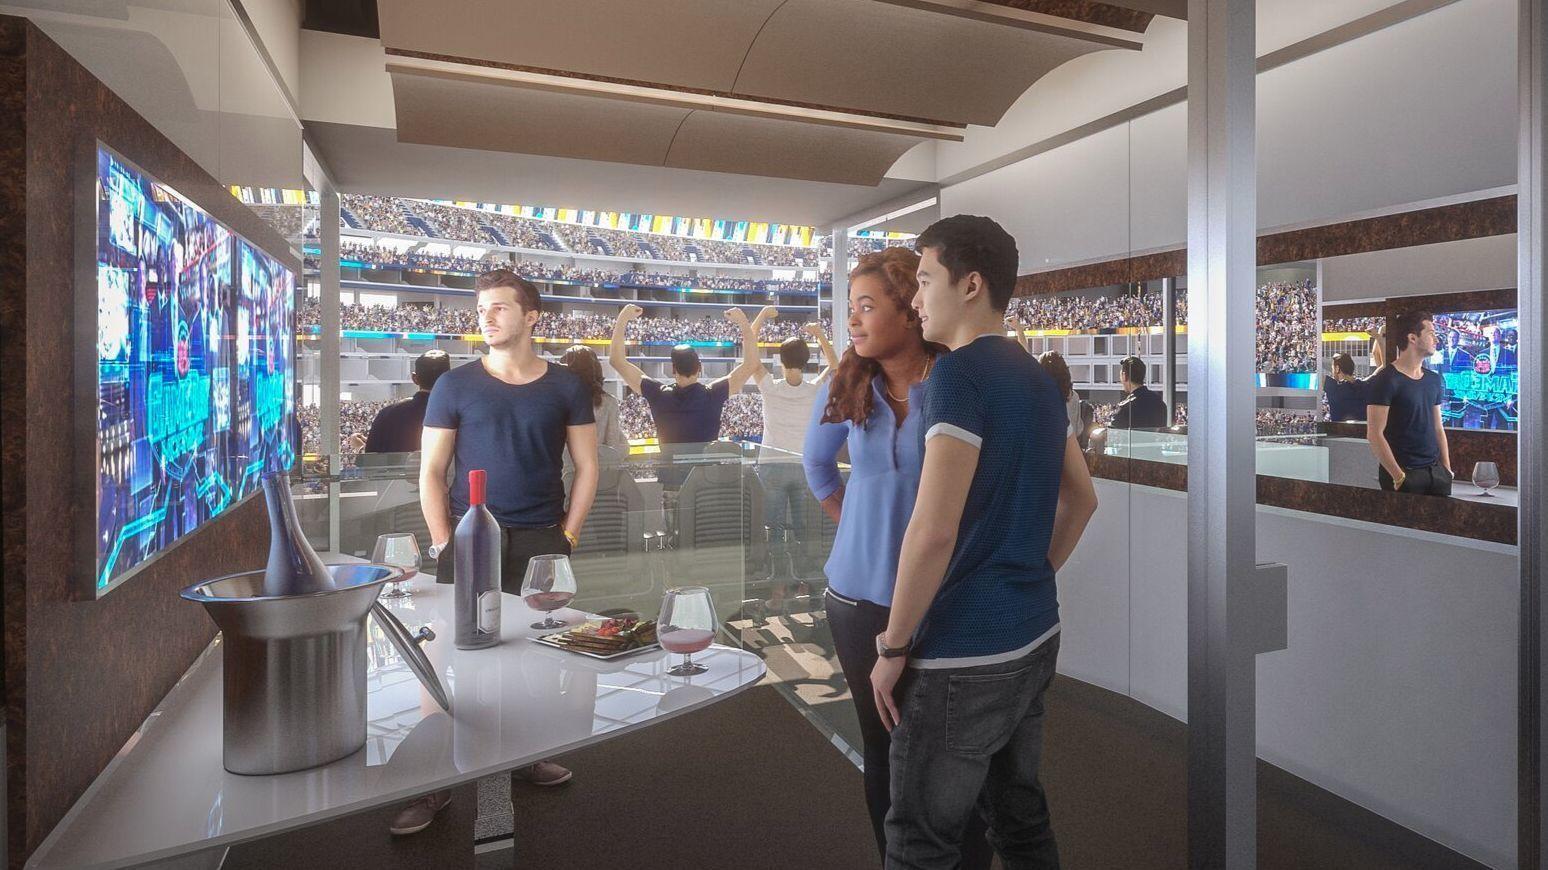 Inglewood Stadium Developers Hope Suites Will Transform